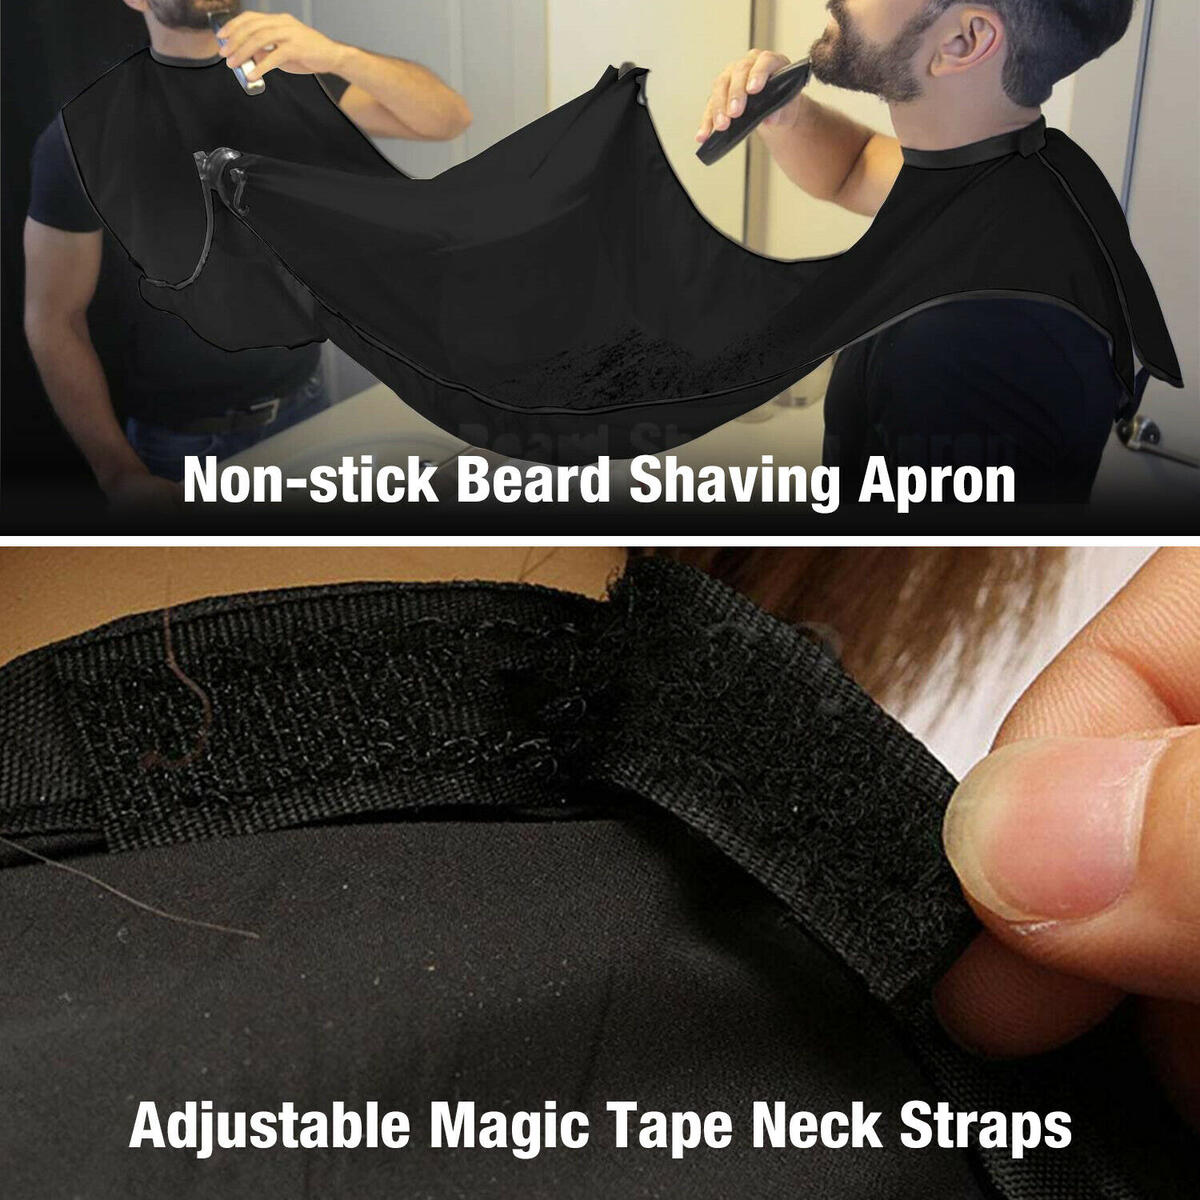 Men Facial Hair Trimmings Catcher Beard Whiskers Bib Shaving Apron Cape Cloth